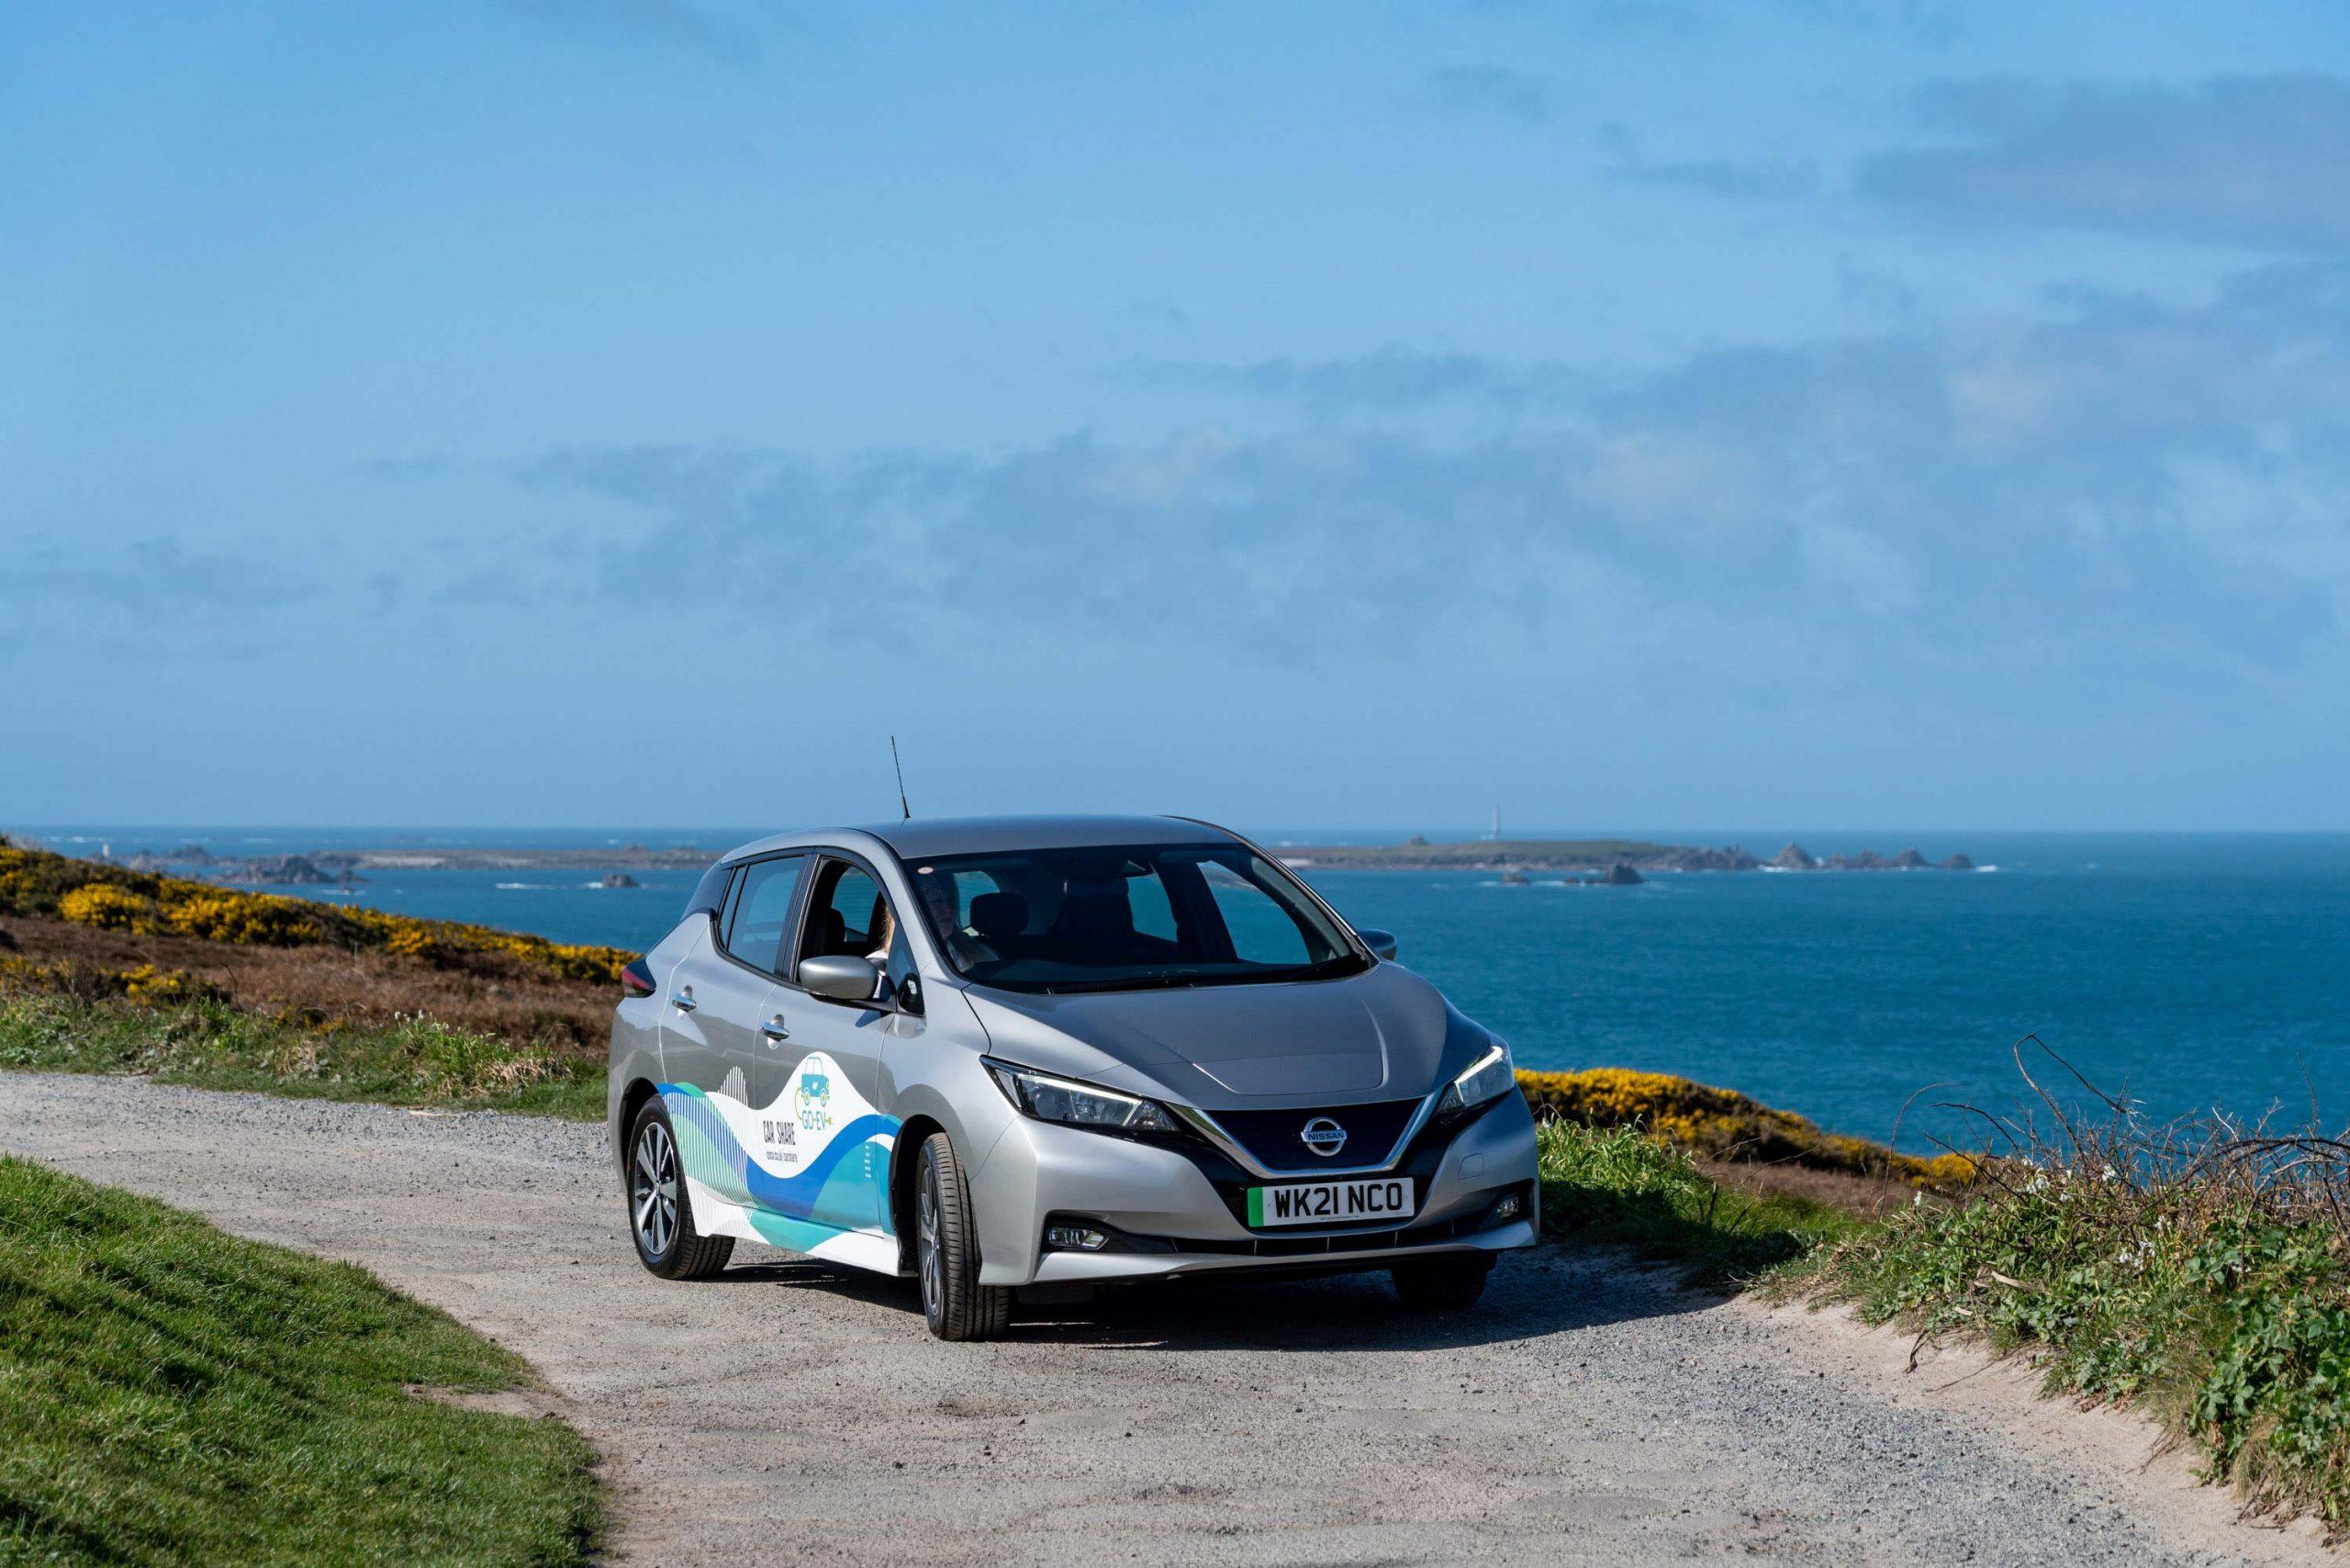 Smart Islands Electric Vehicles GO-EV SMART: Growth Deal contribution: £0.61m